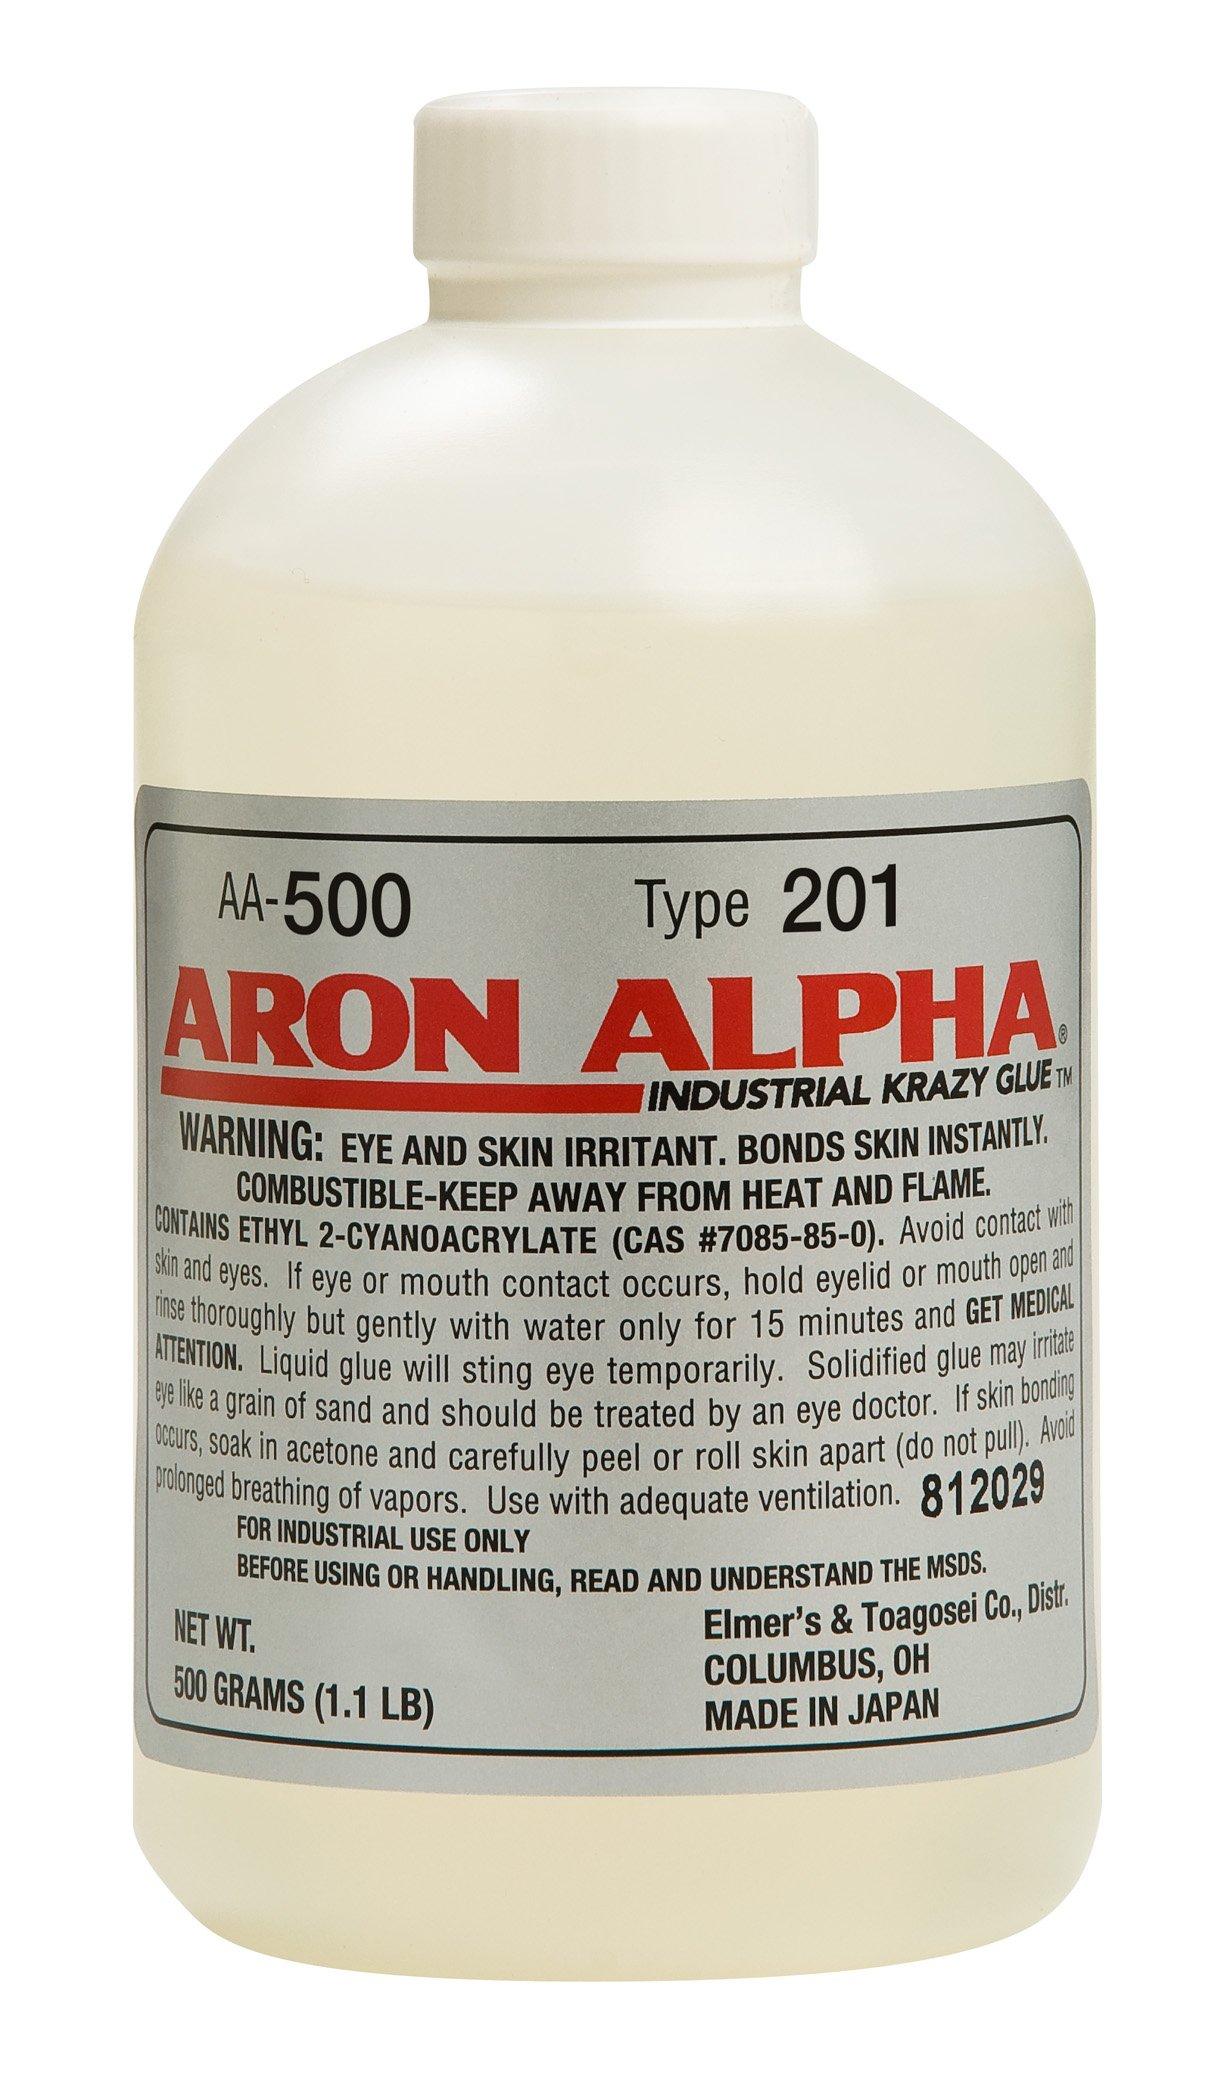 Aron Alpha Type 201 (2 cps viscosity) Regular Set Instant Adhesive 500 g (1.1 pound) Bottle